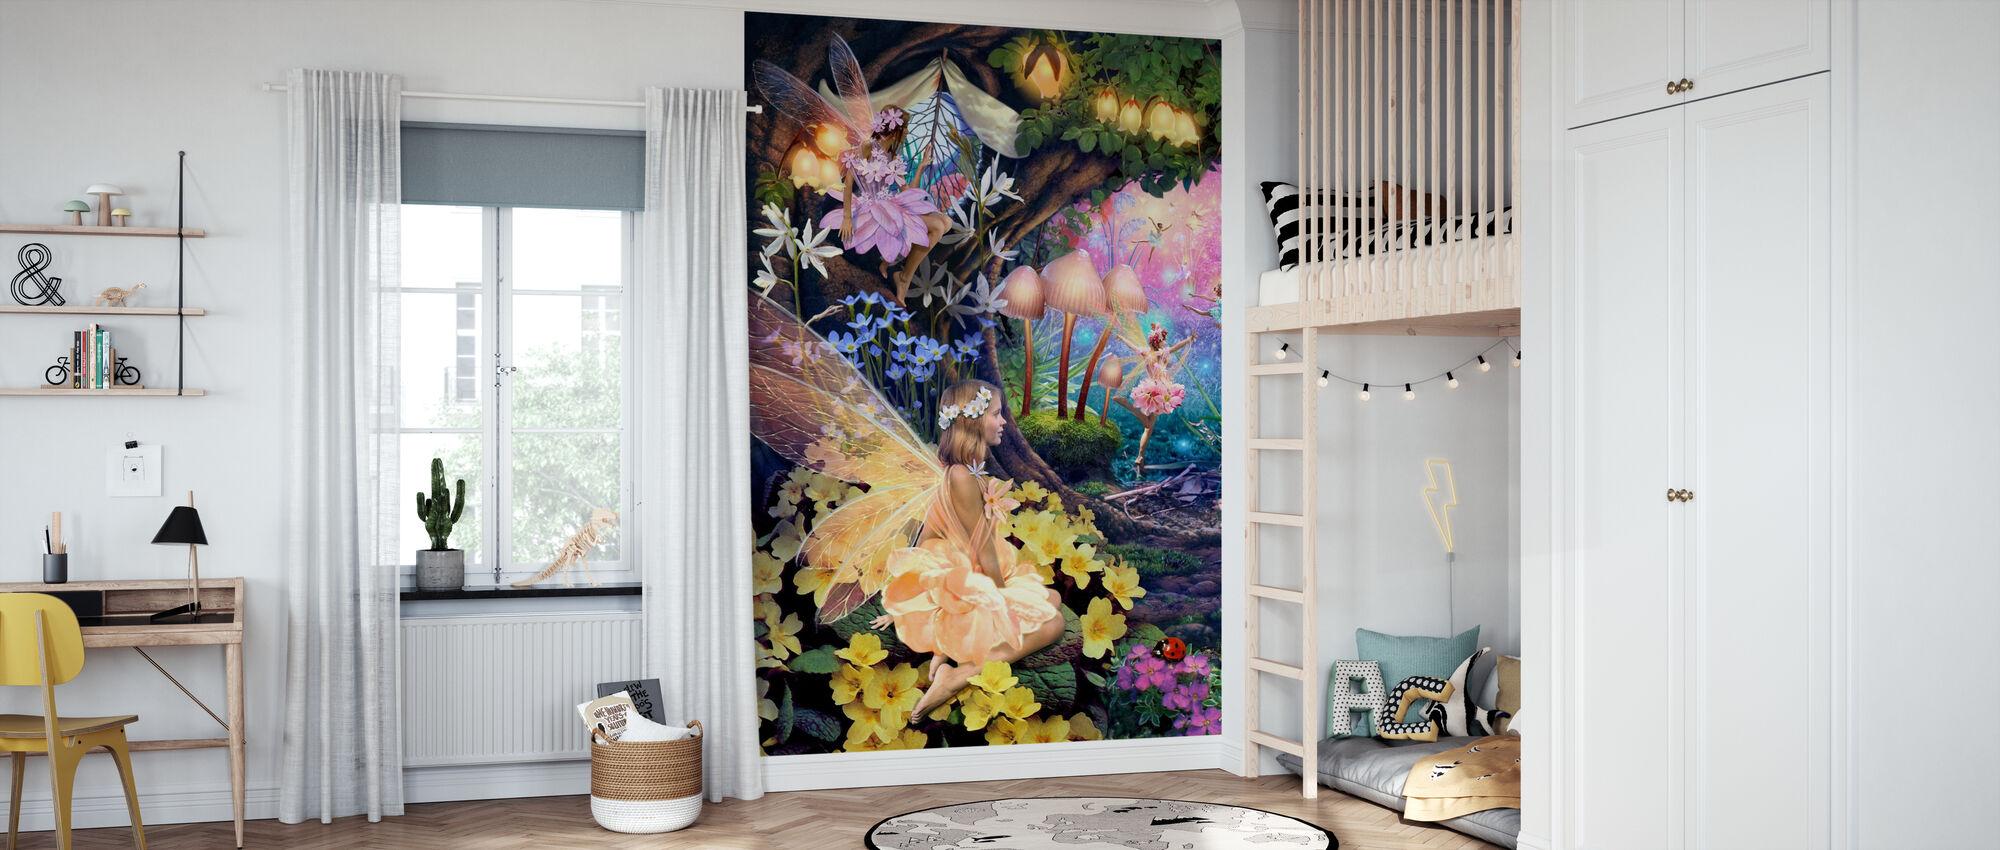 Fairy Hollow 2 - Wallpaper - Kids Room